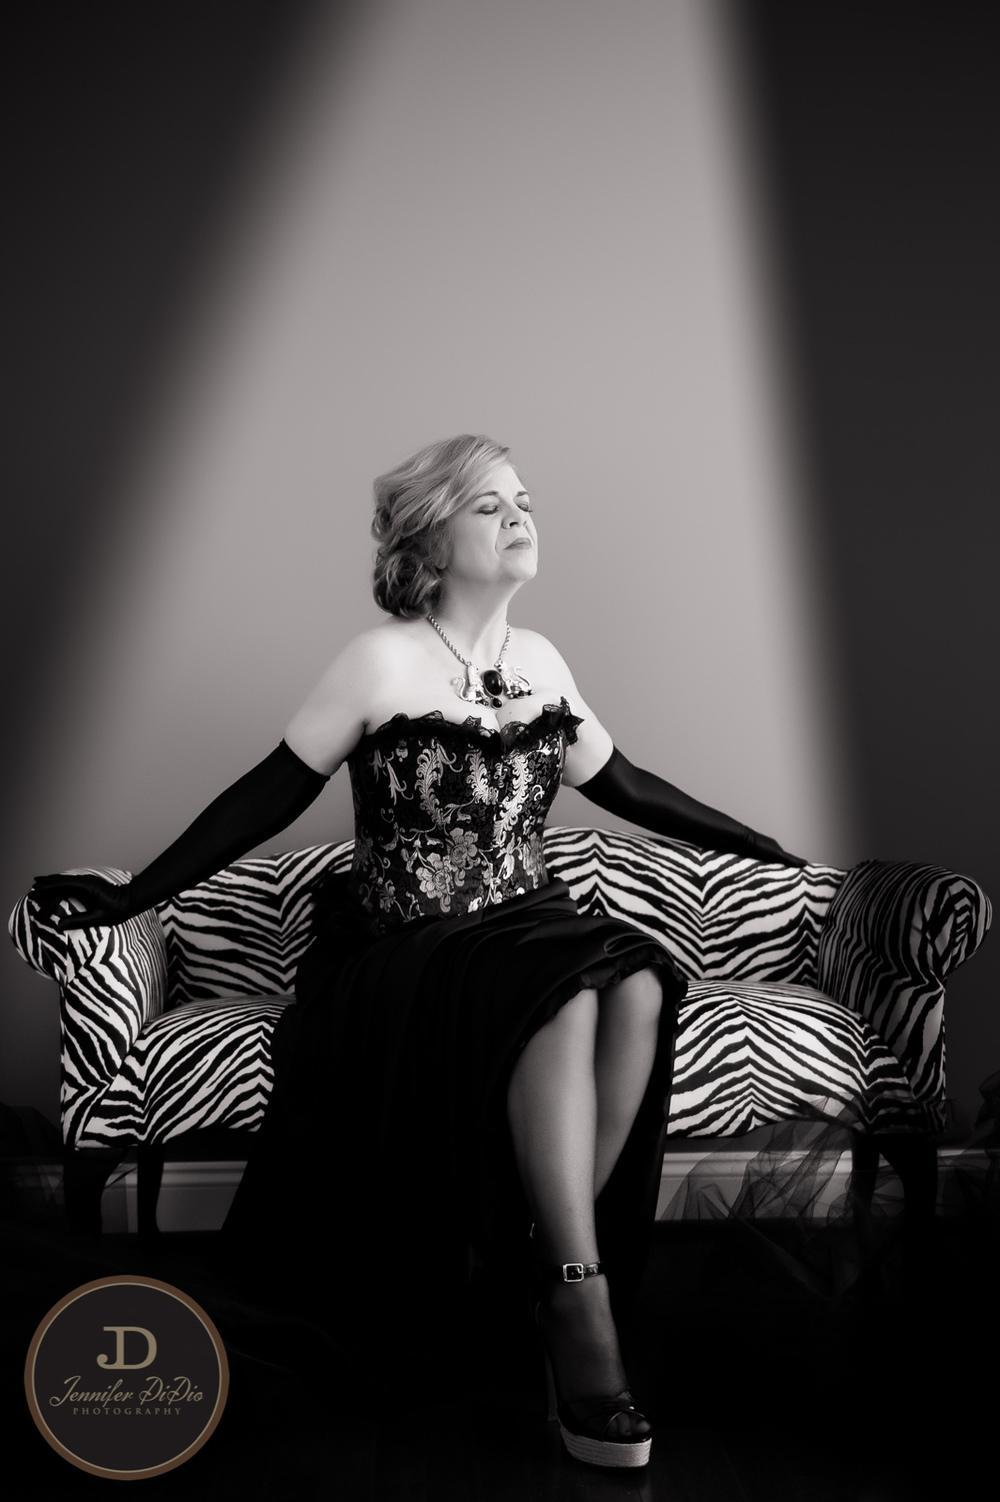 Jennifer.DiDio.Photography.Wroe.Judi.2014-191.jpg